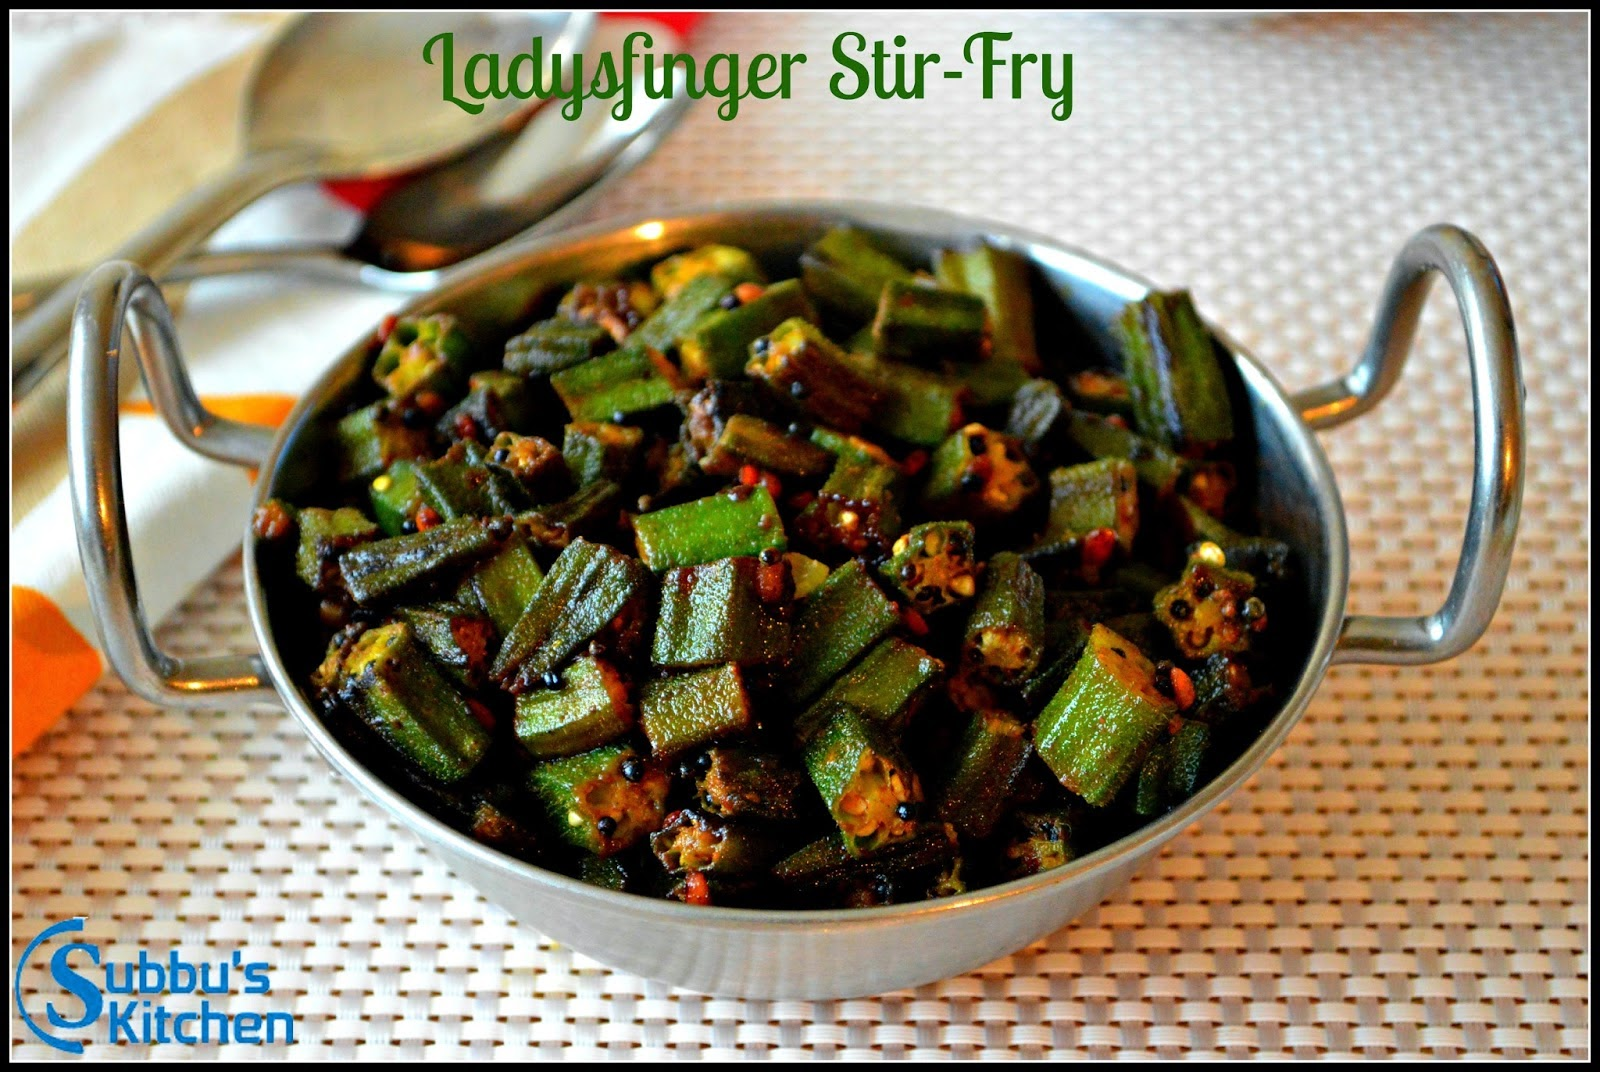 Ladysfinger Stir-Fry